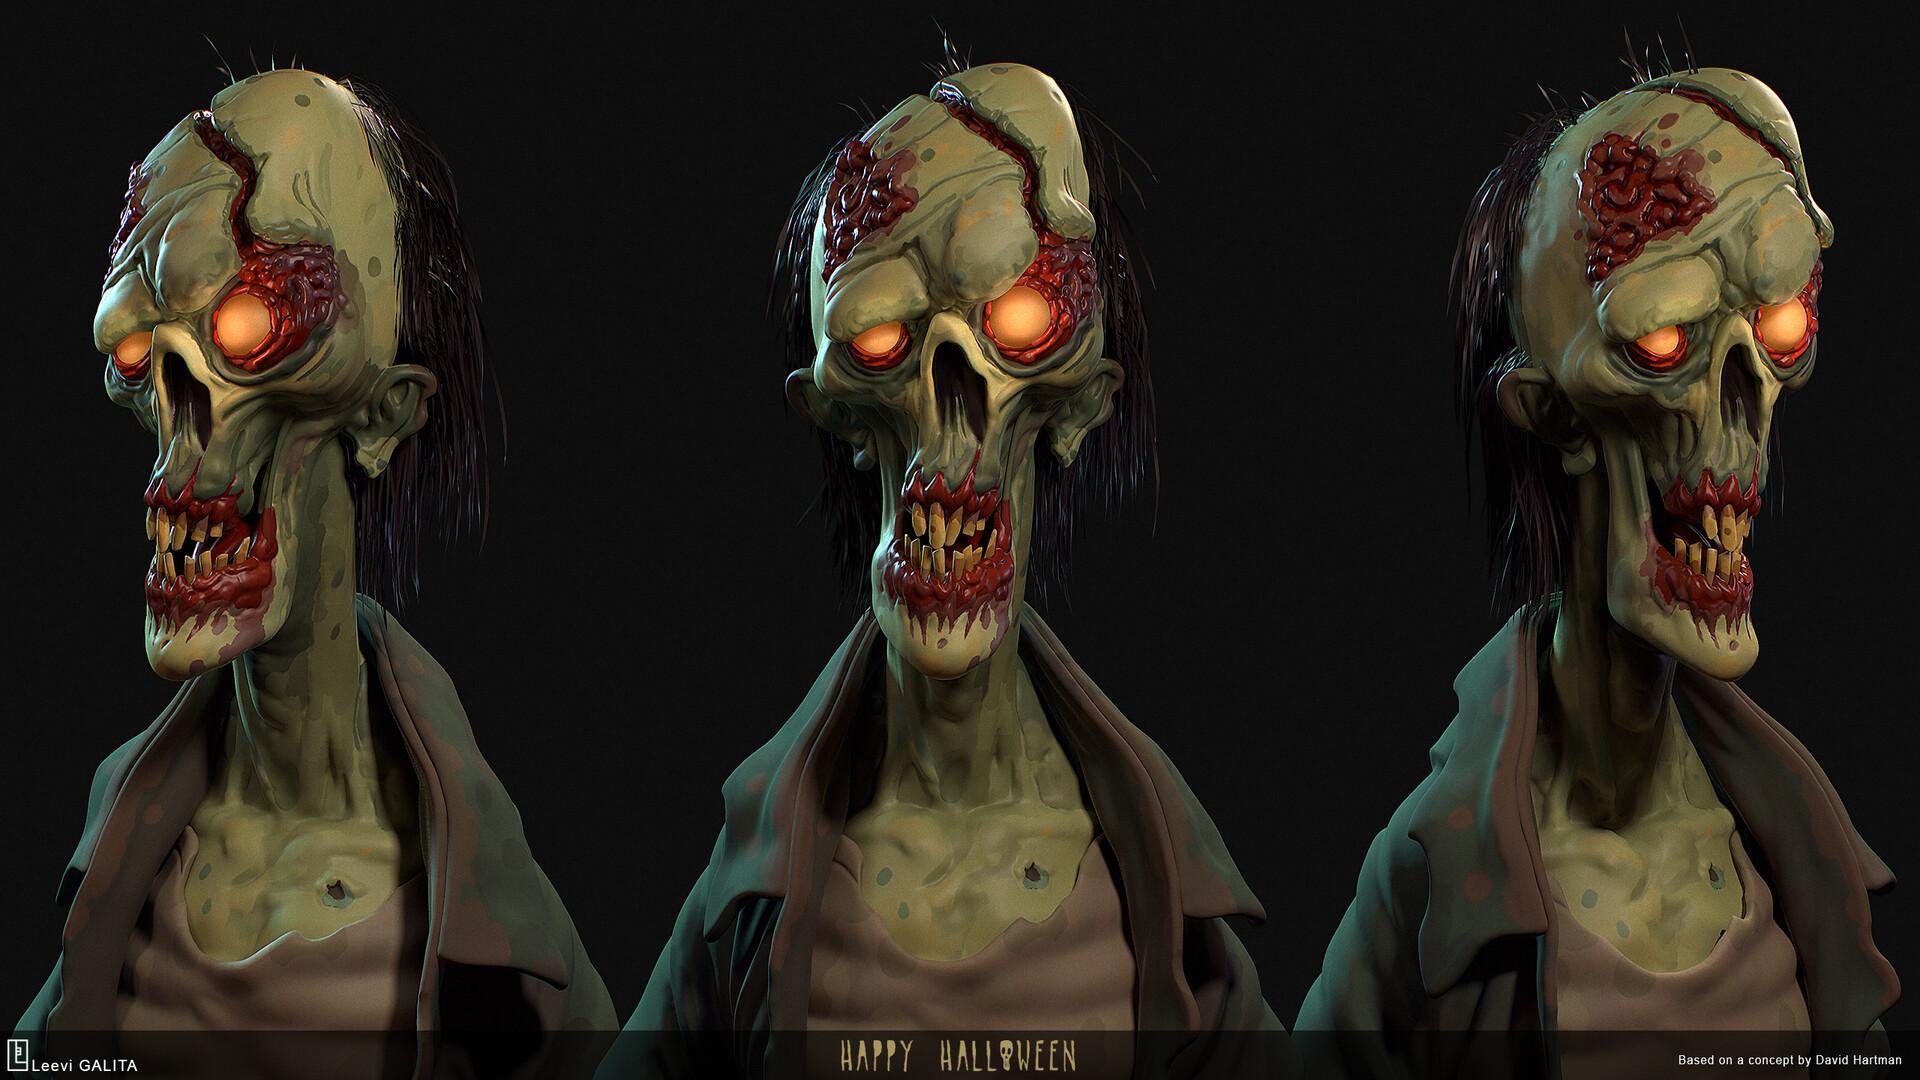 Leevi galita zombiemodel